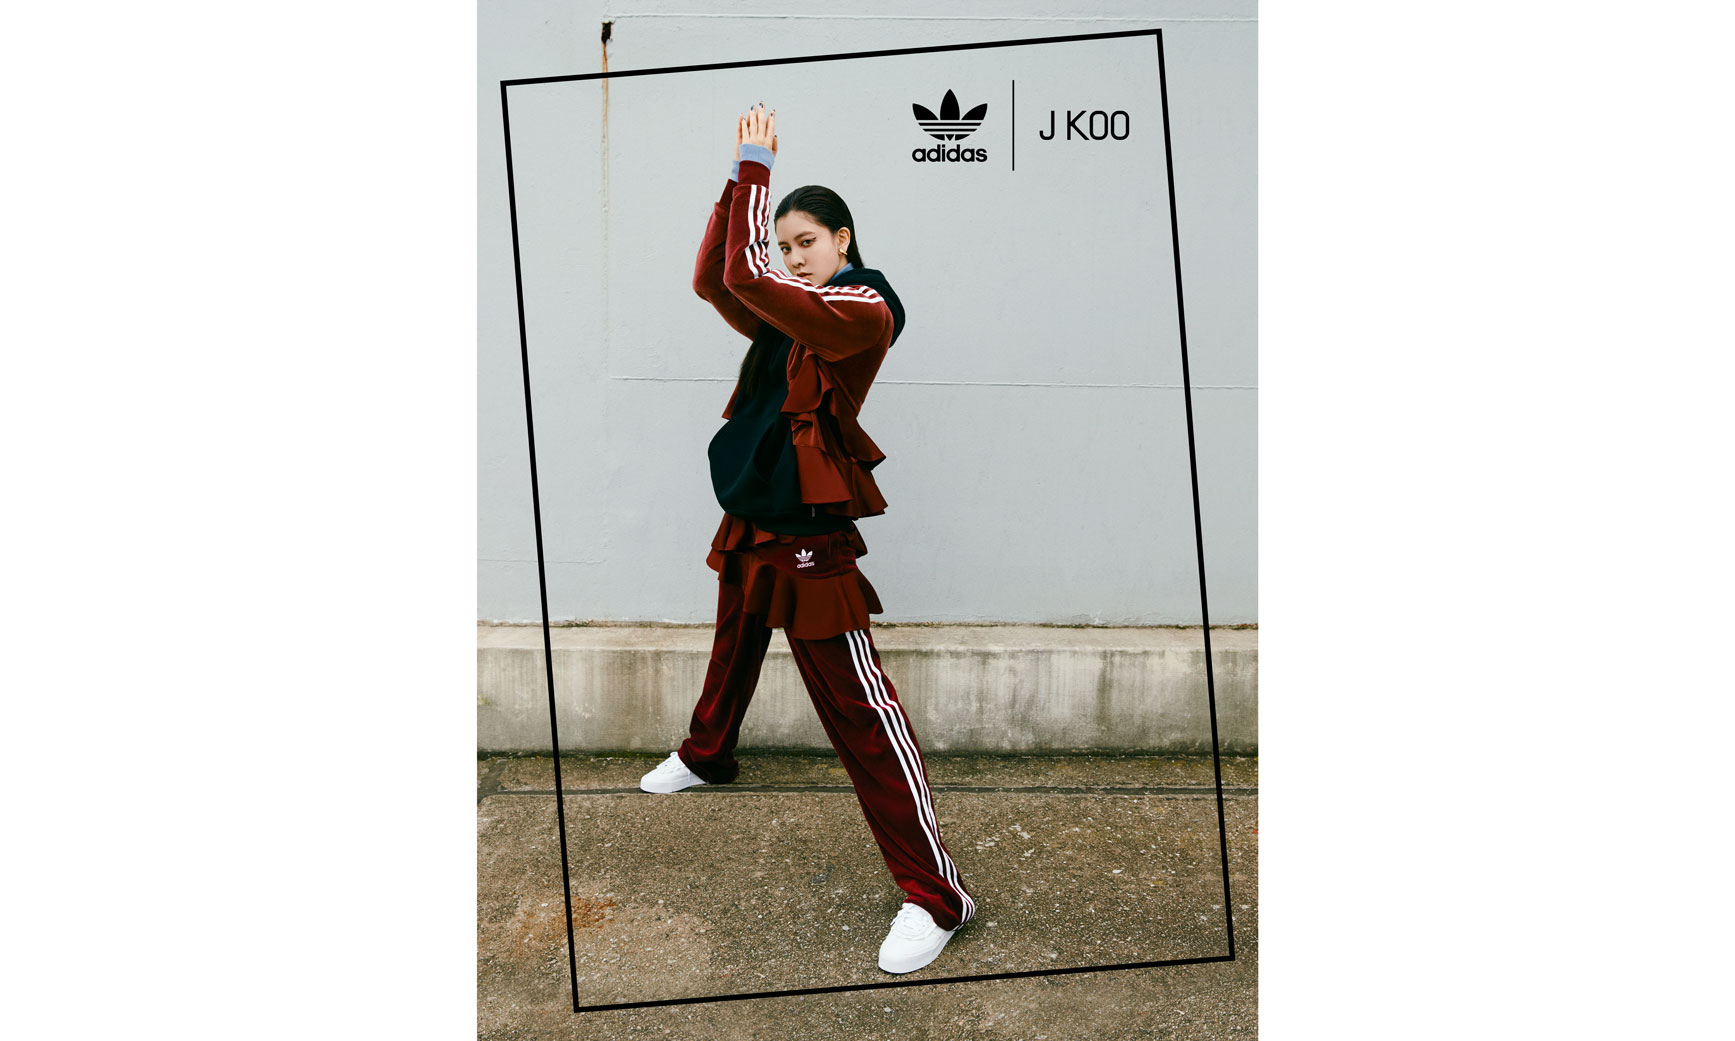 adidas Originals by J KOO 联名系列正式公布